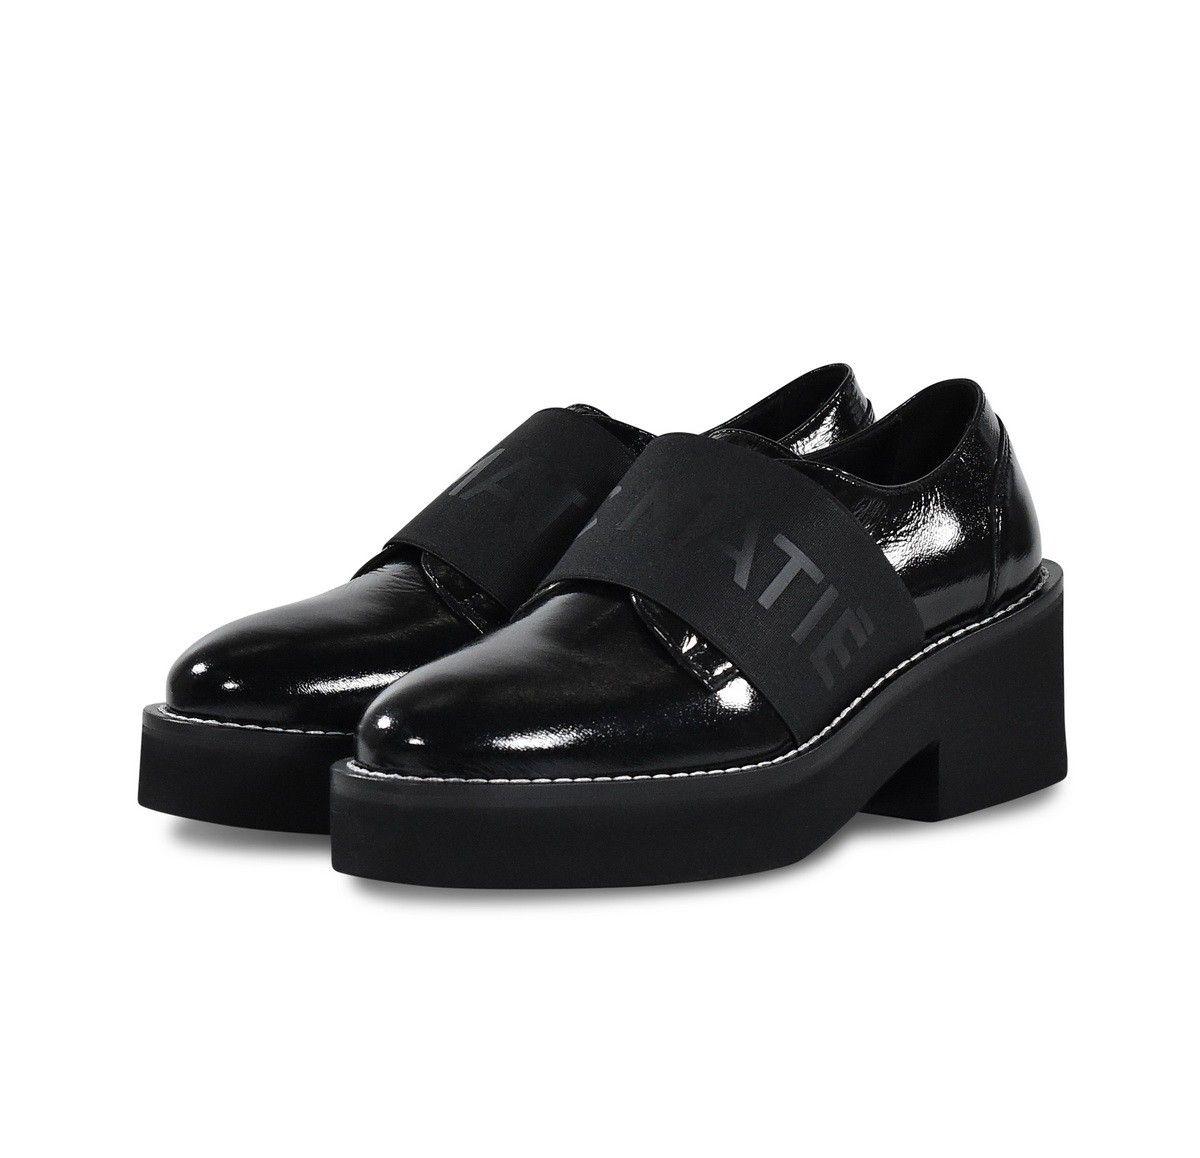 VIC MATIE - Damen Schuhe - Scarpa Gloss - Nero